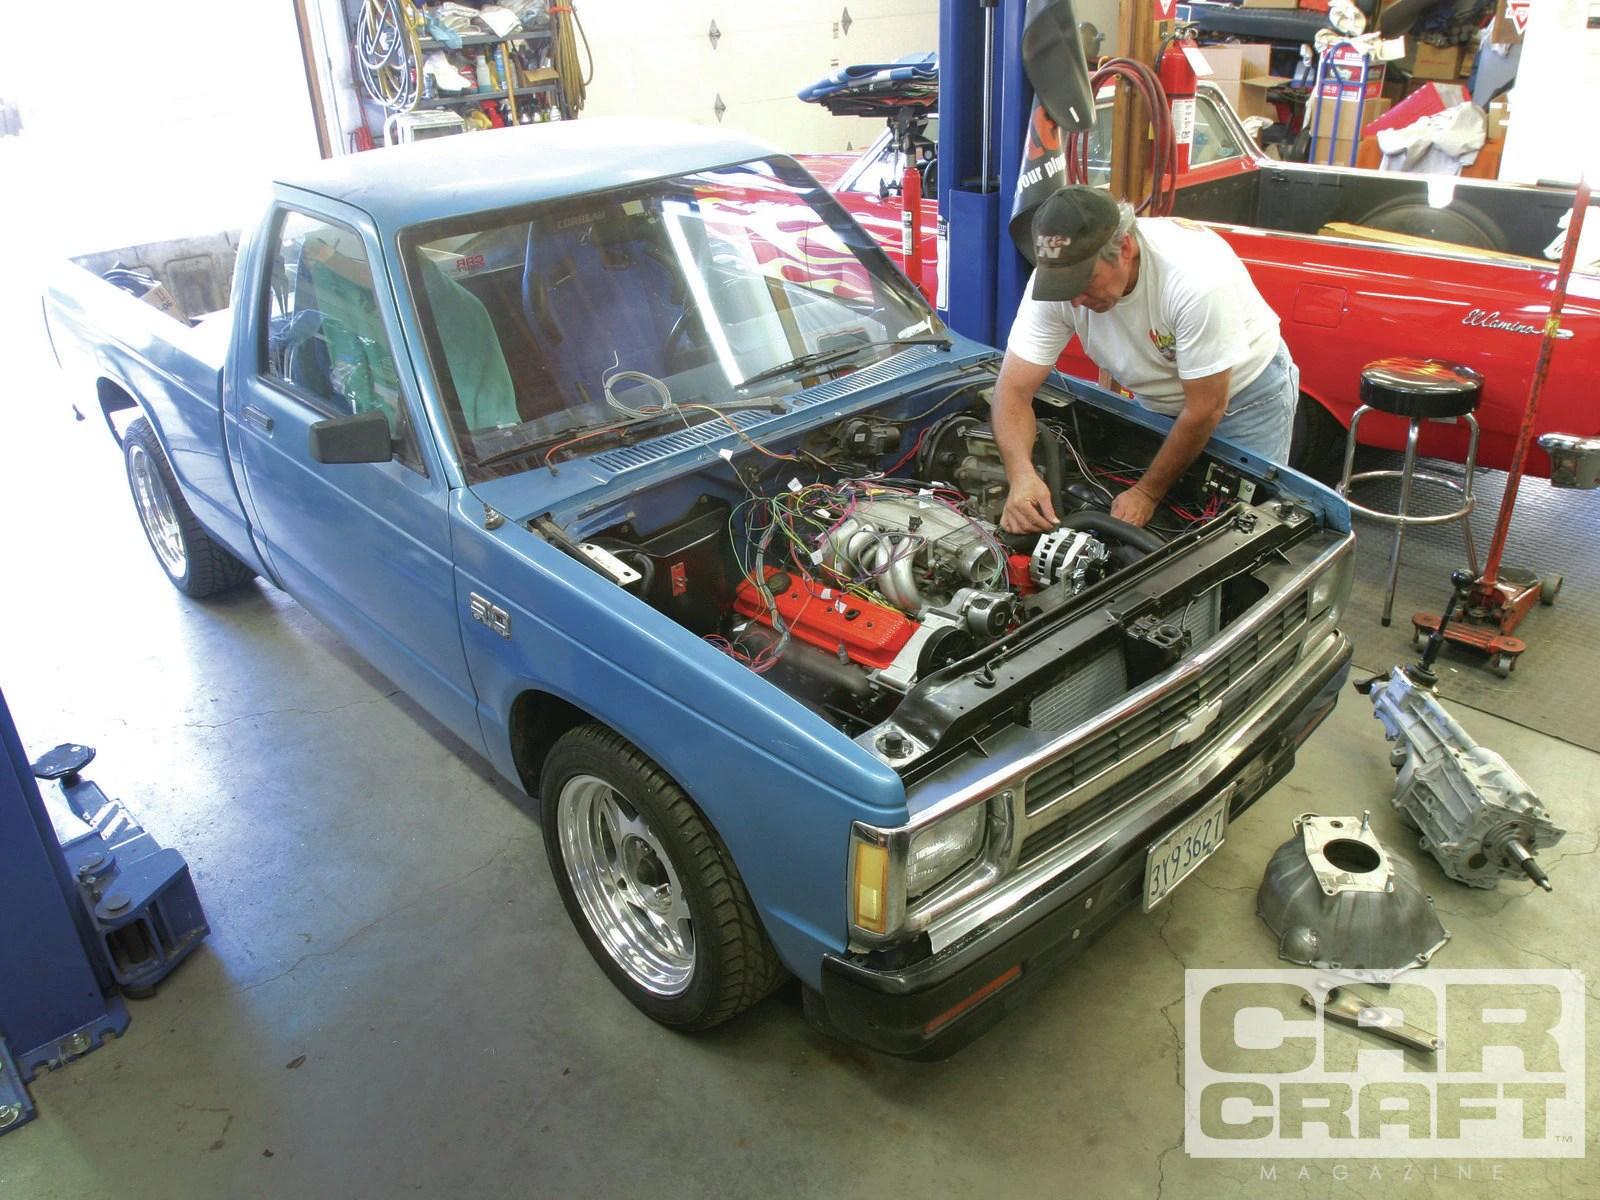 2012 Chevrolet Colorado Wiring Harness from i1.wp.com